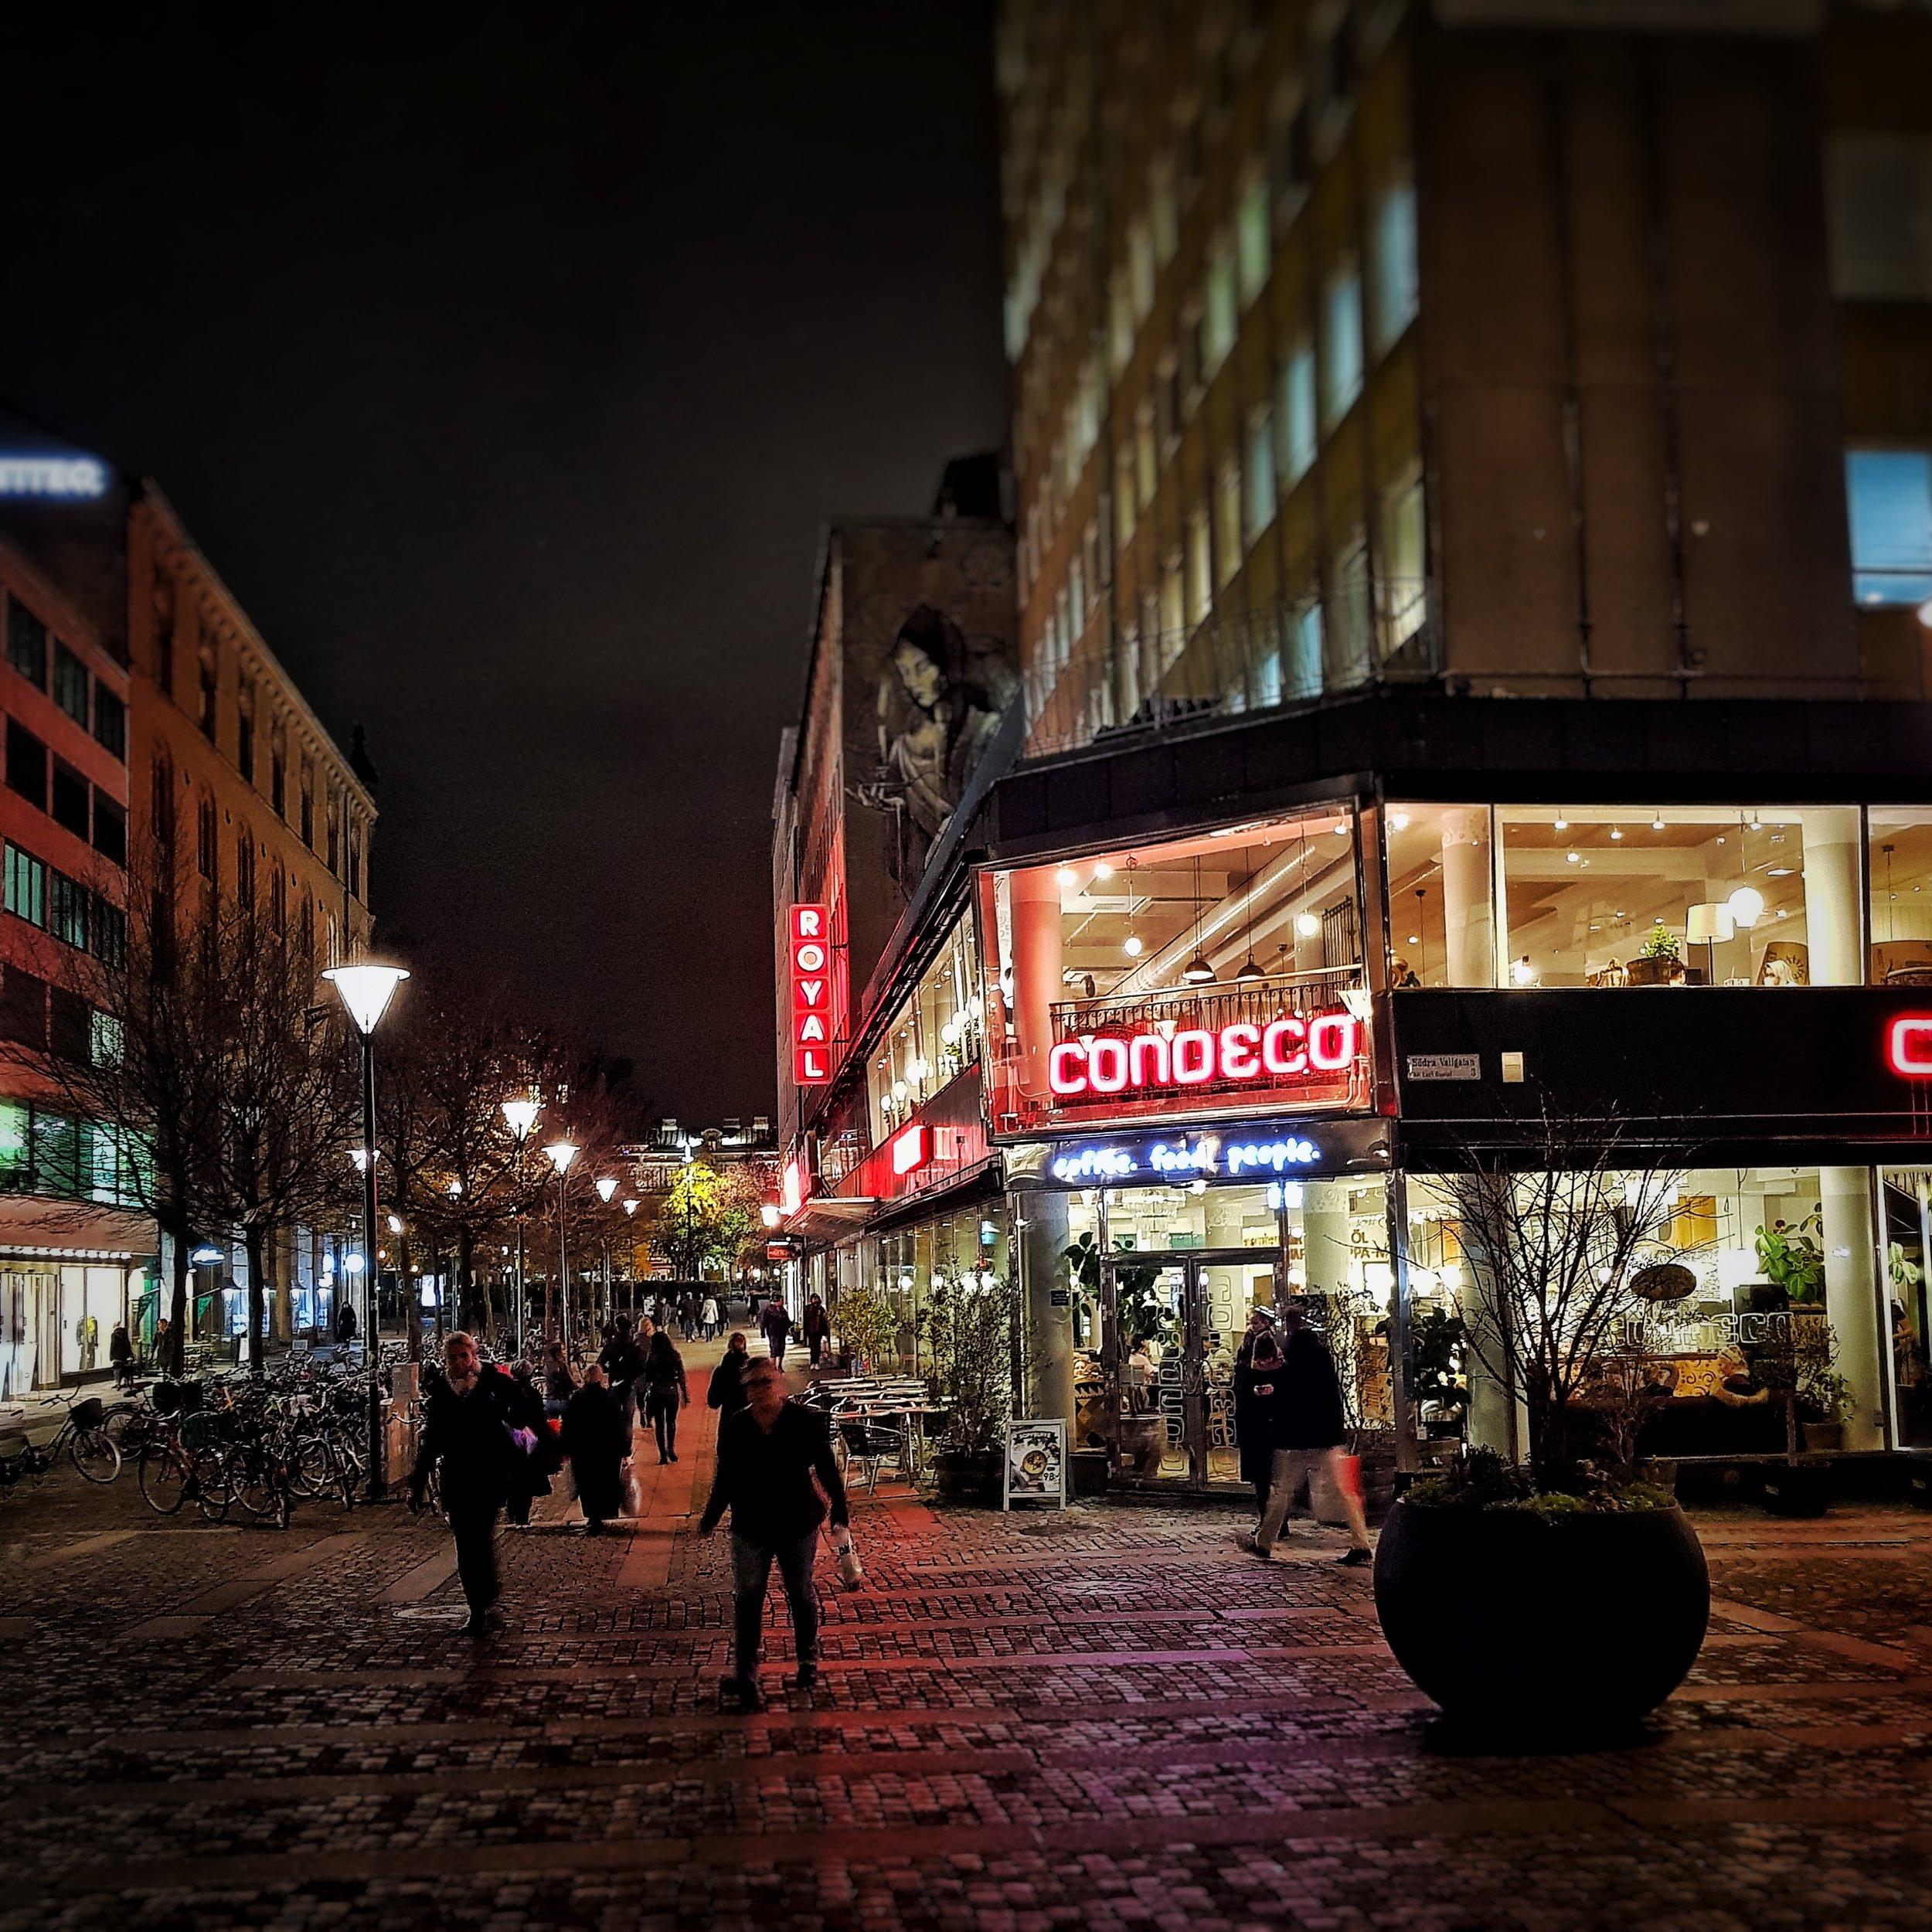 Day 318 - November 14: Night in the City